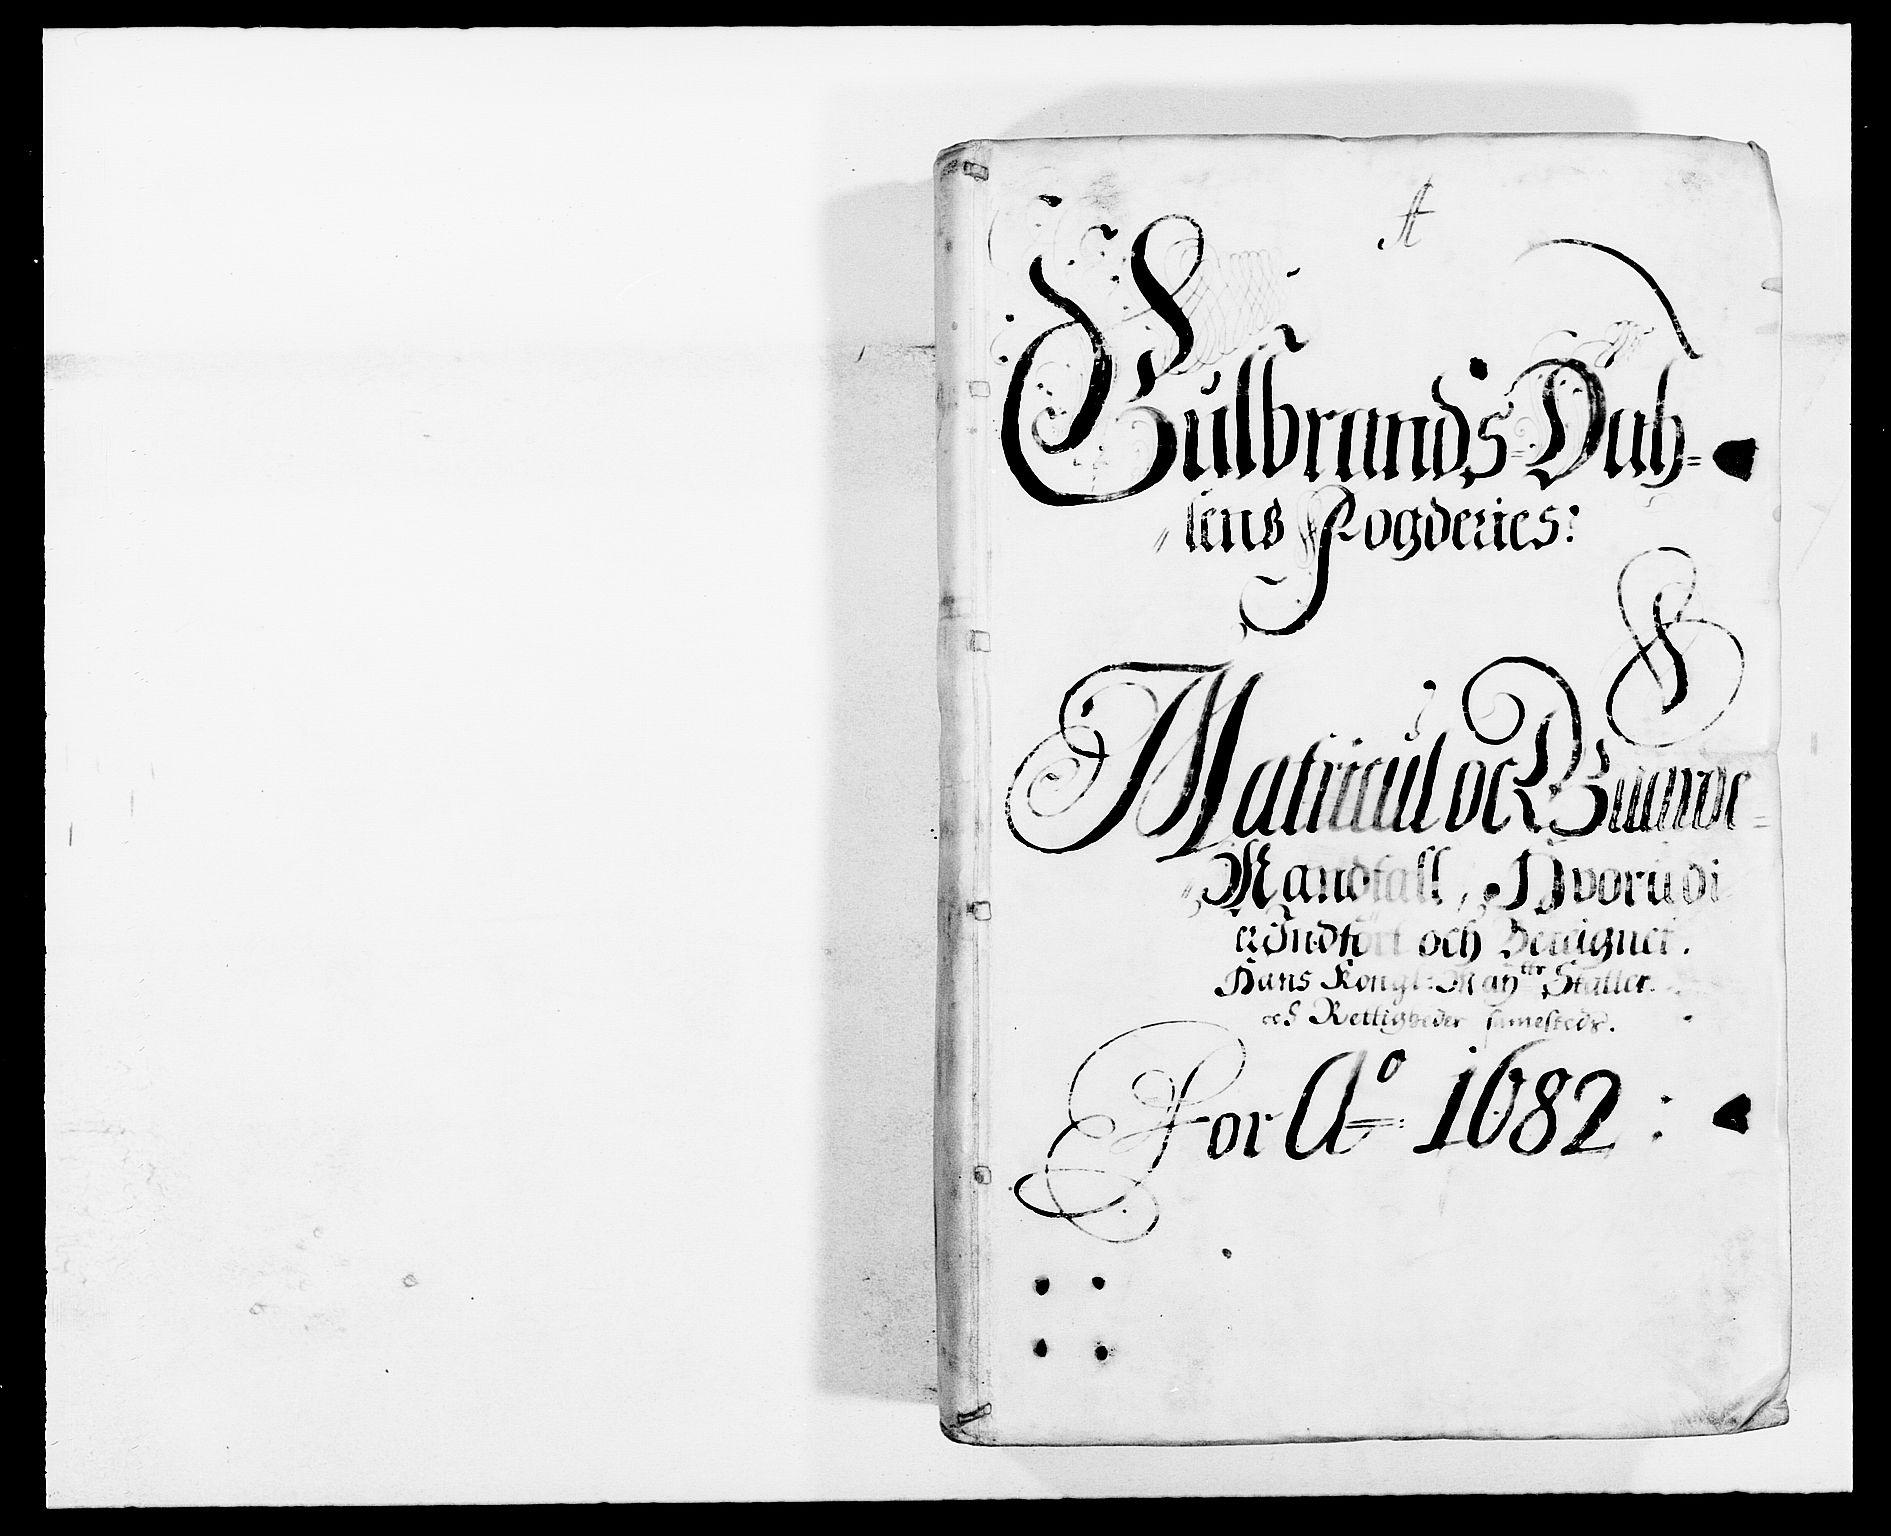 RA, Rentekammeret inntil 1814, Reviderte regnskaper, Fogderegnskap, R17/L1157: Fogderegnskap Gudbrandsdal, 1682-1689, s. 57